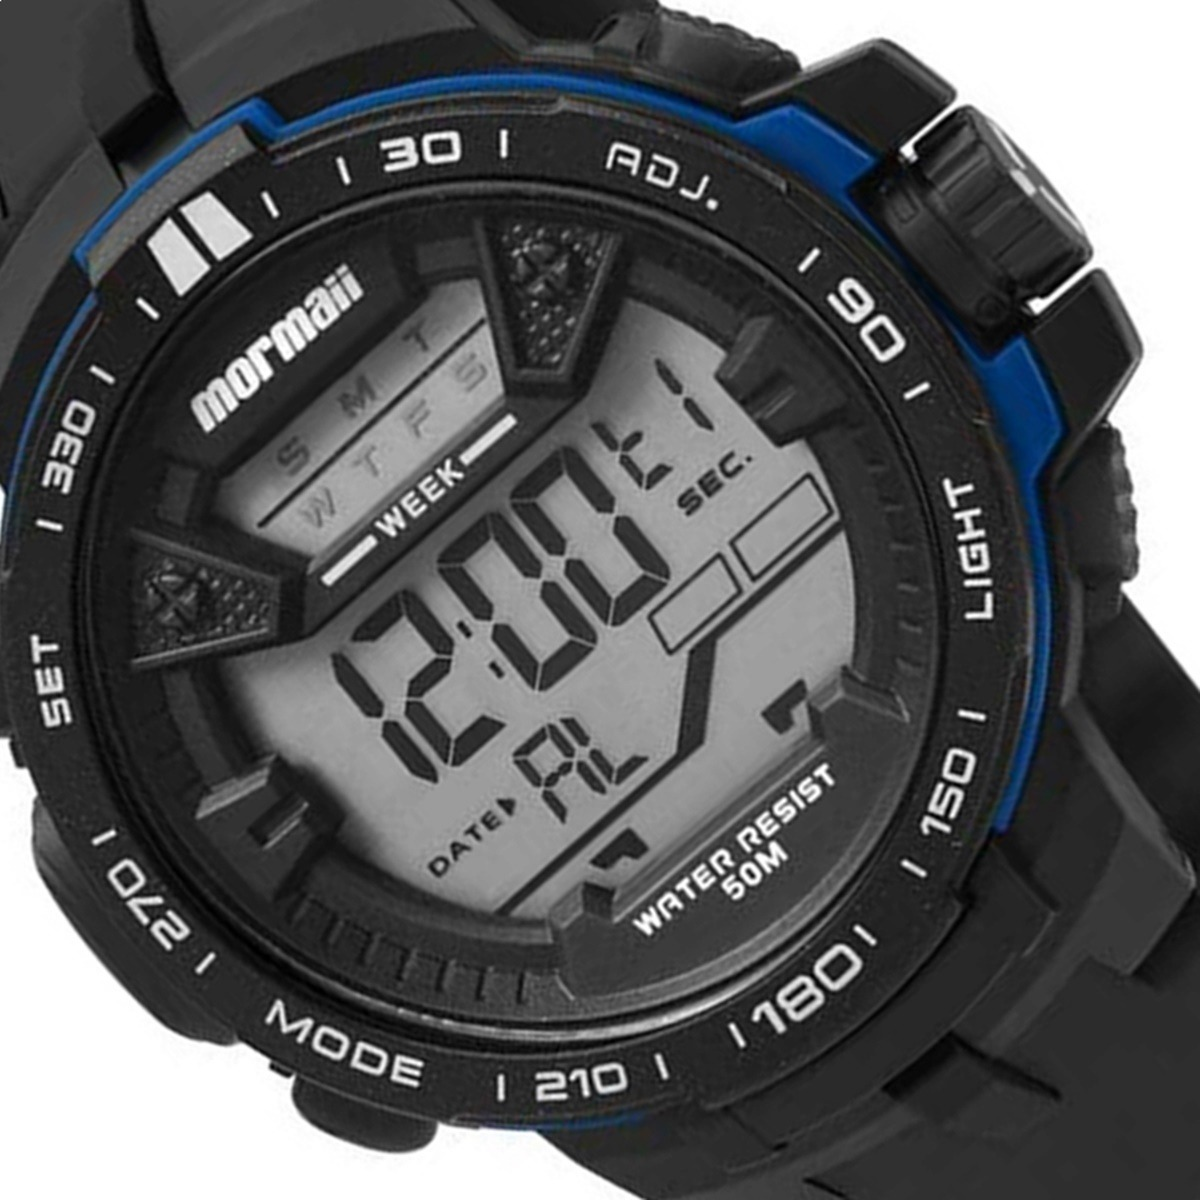 eca5152b883 relógio mormaii digital masculino esportivo cronômetro. Carregando zoom... relógio  mormaii masculino. Carregando zoom.